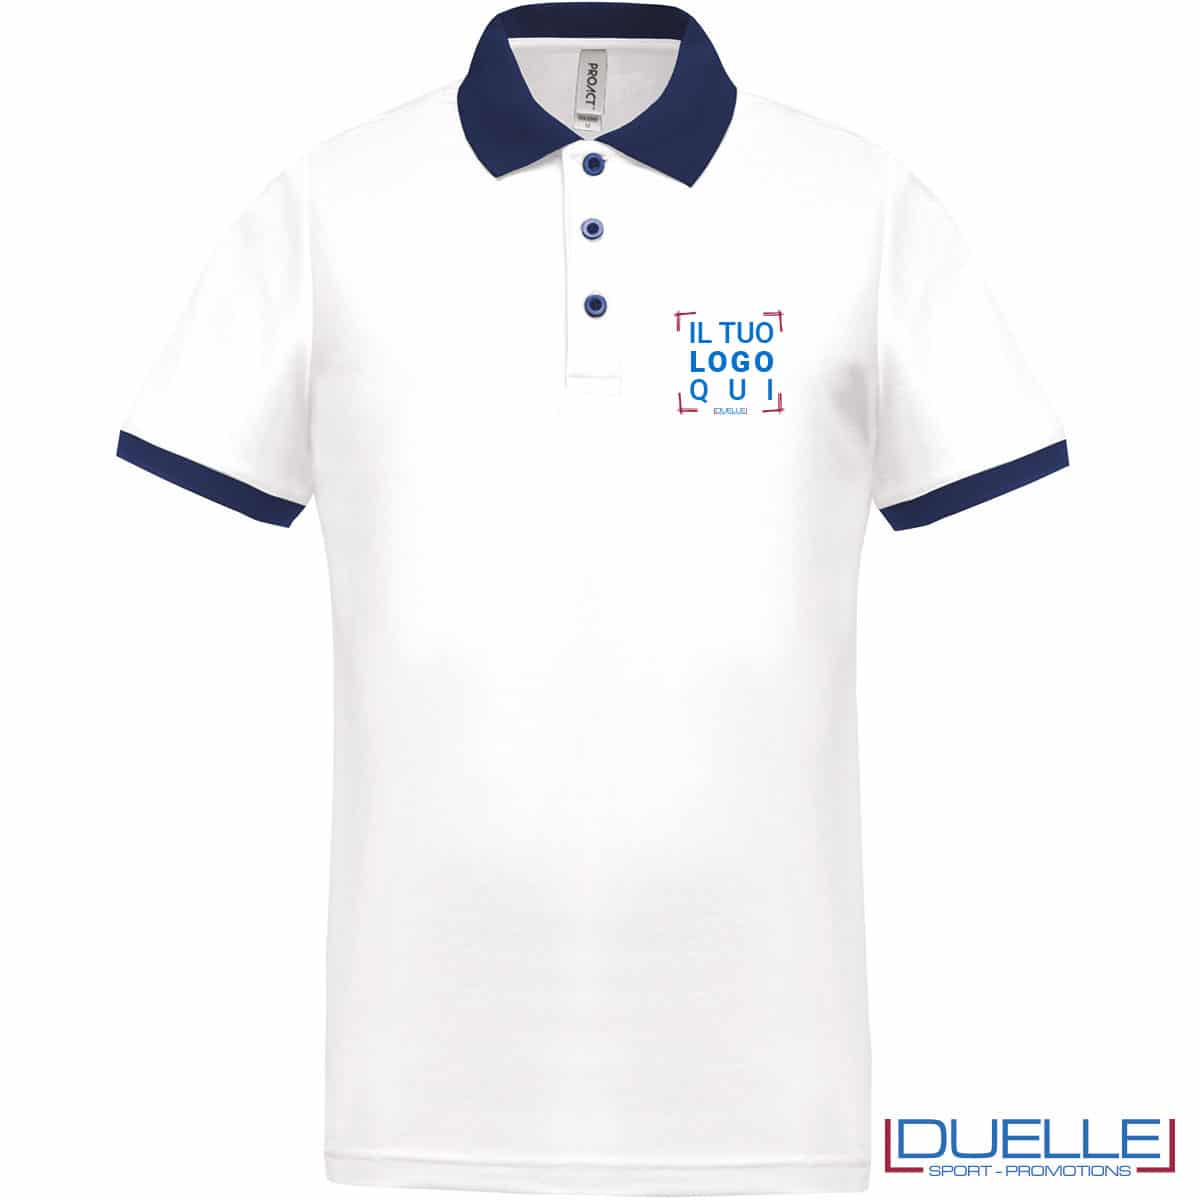 polo bianca da uomo dettagli blu navy con logo